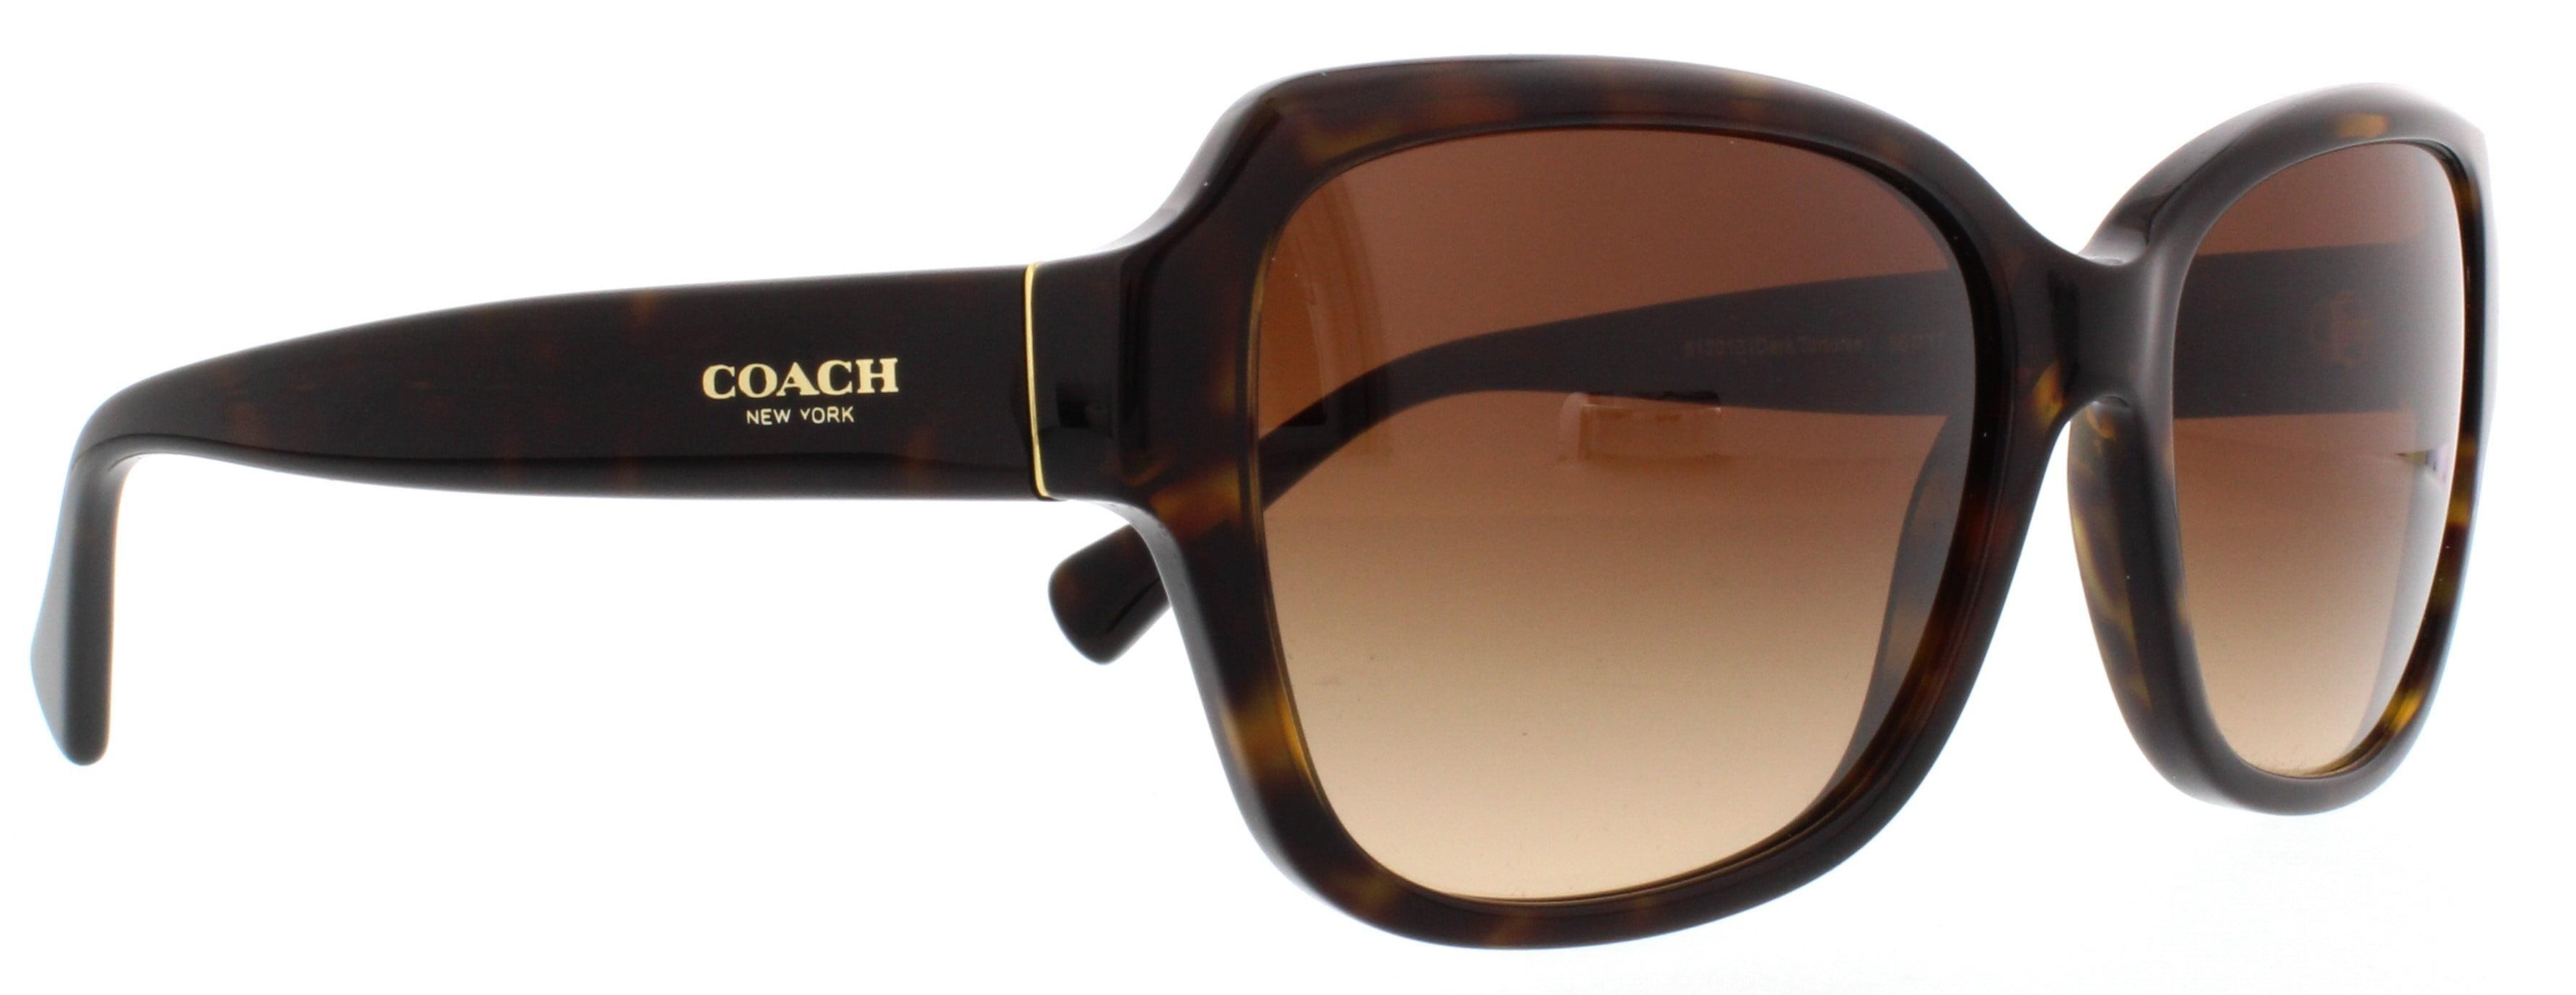 fdda46f768 Coach - COACH Sunglasses HC8160 512013 Dark Tortoise 56MM - Walmart.com